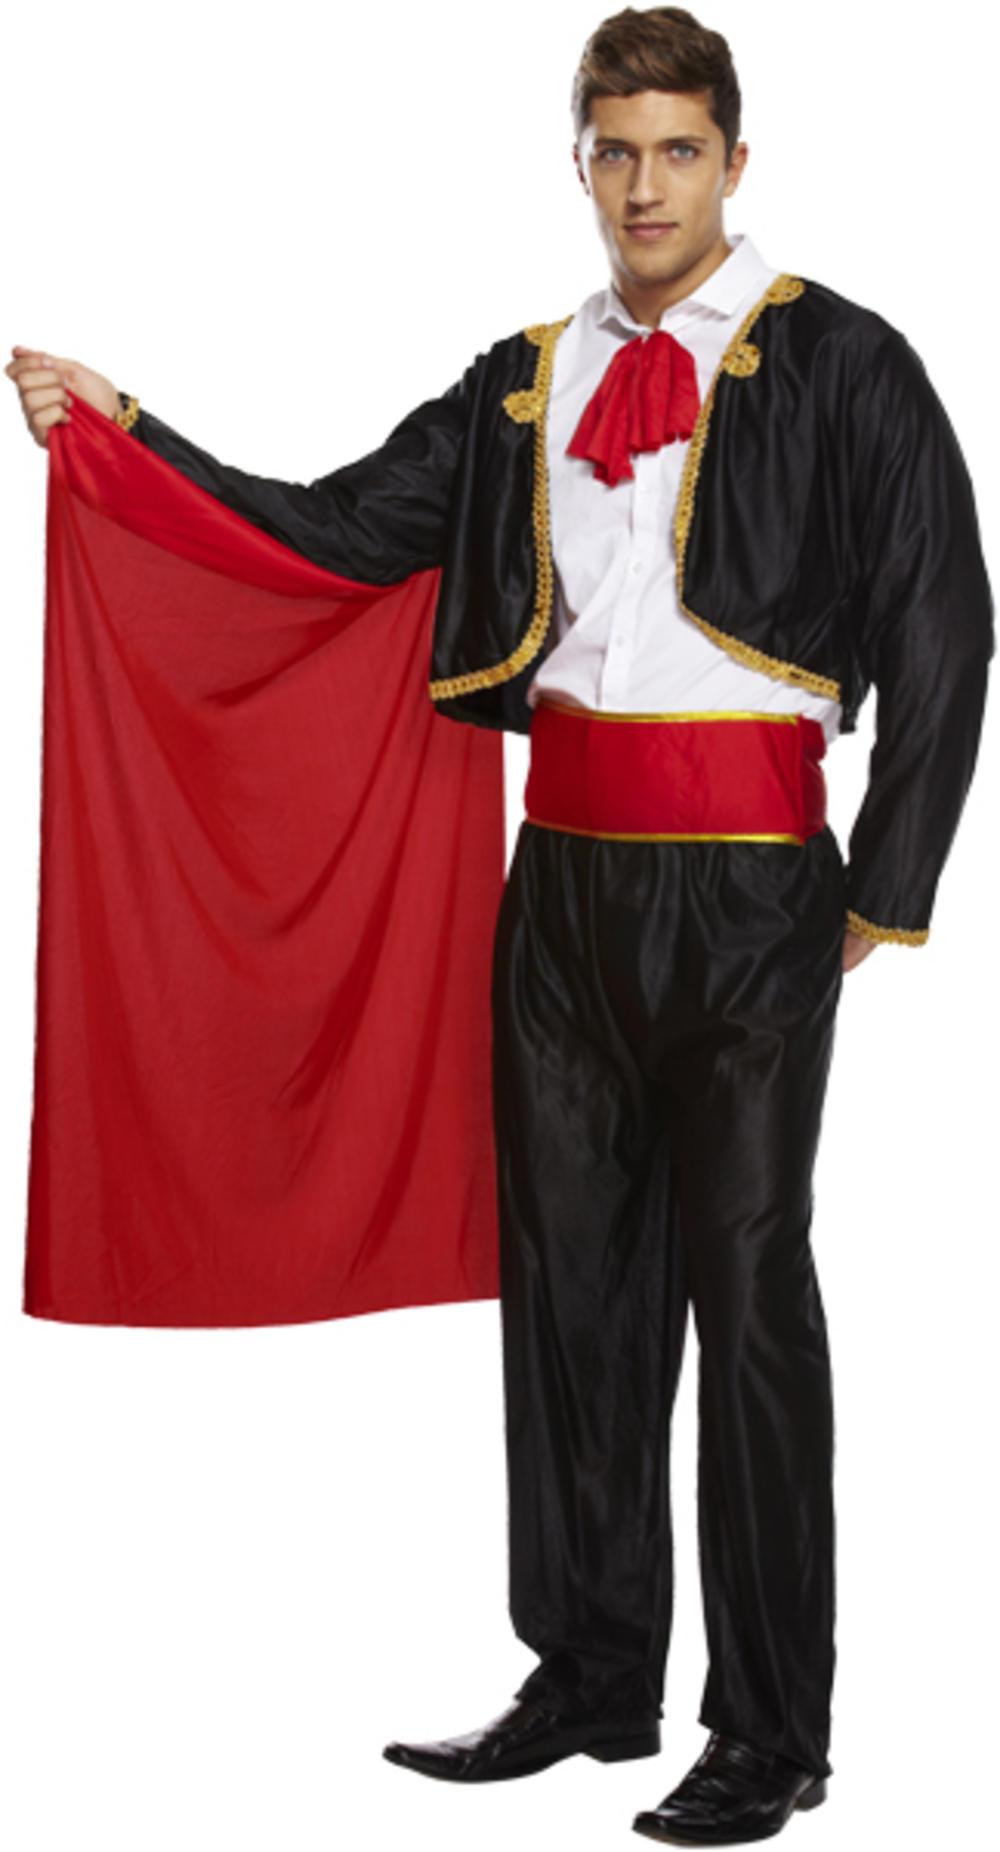 Spanish Matador Costume